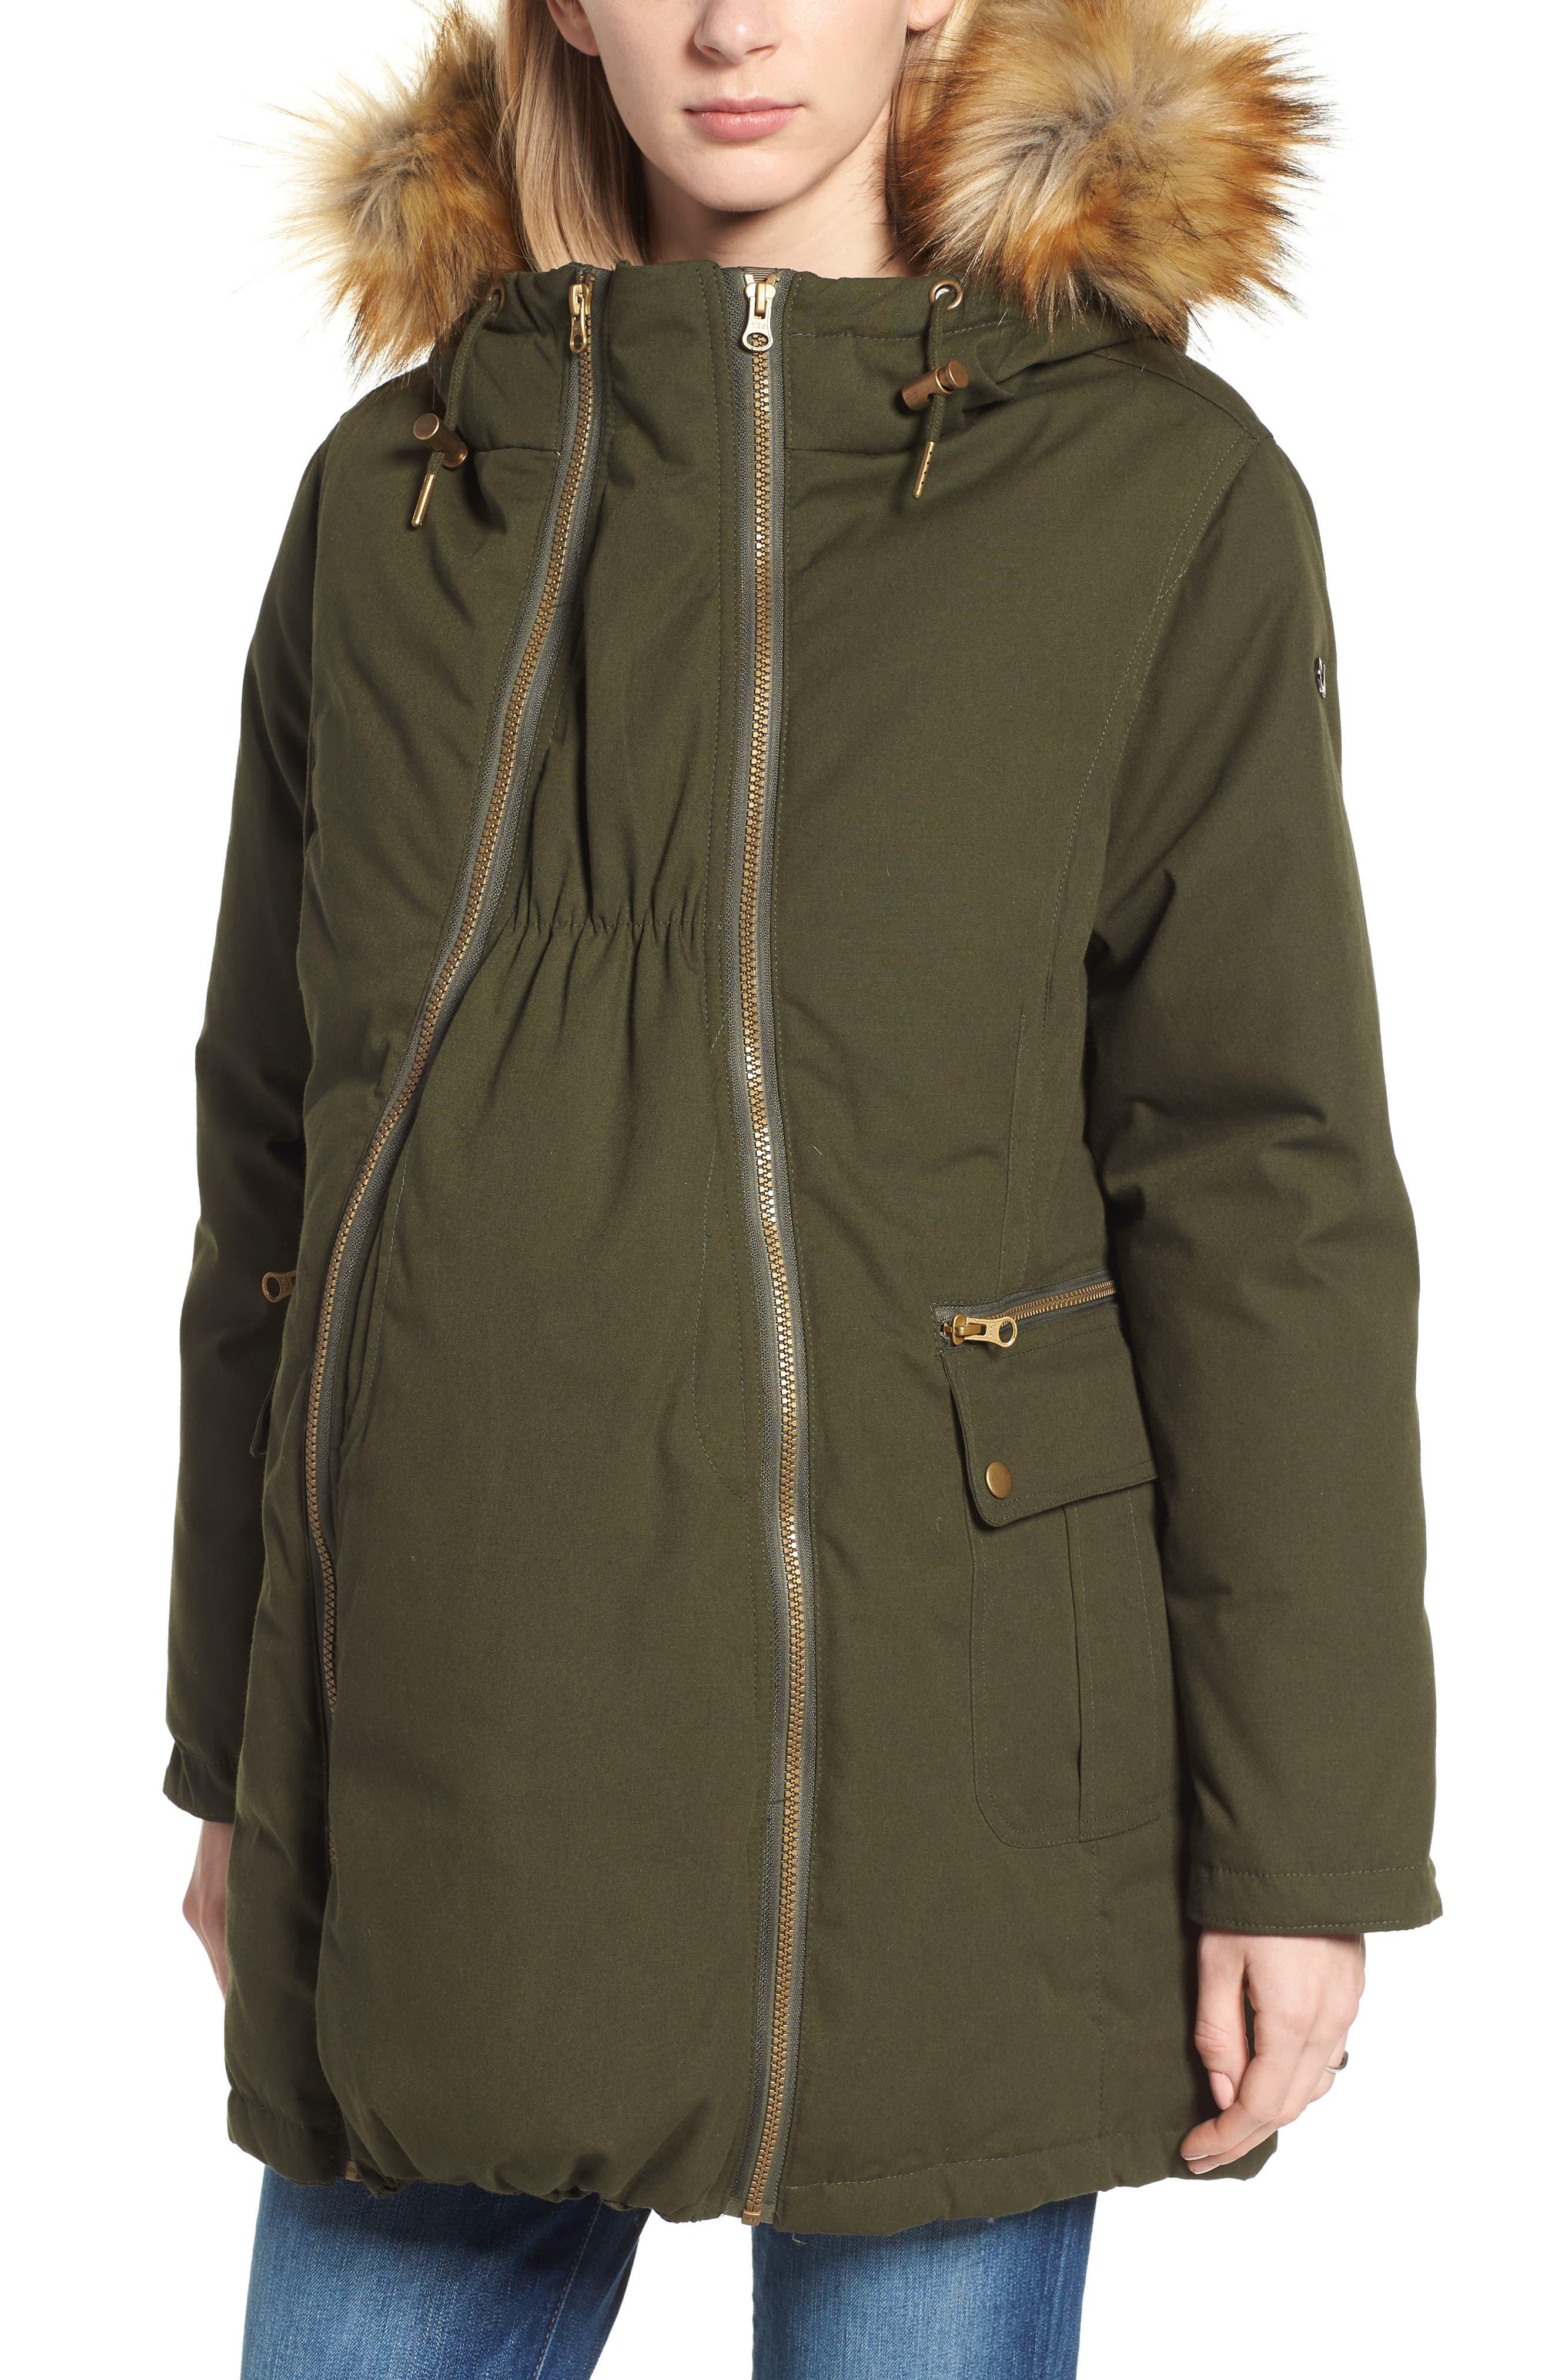 Convertible Down 3-in-1 Maternity Jacket,                             Main thumbnail 1, color,                             Khaki Green